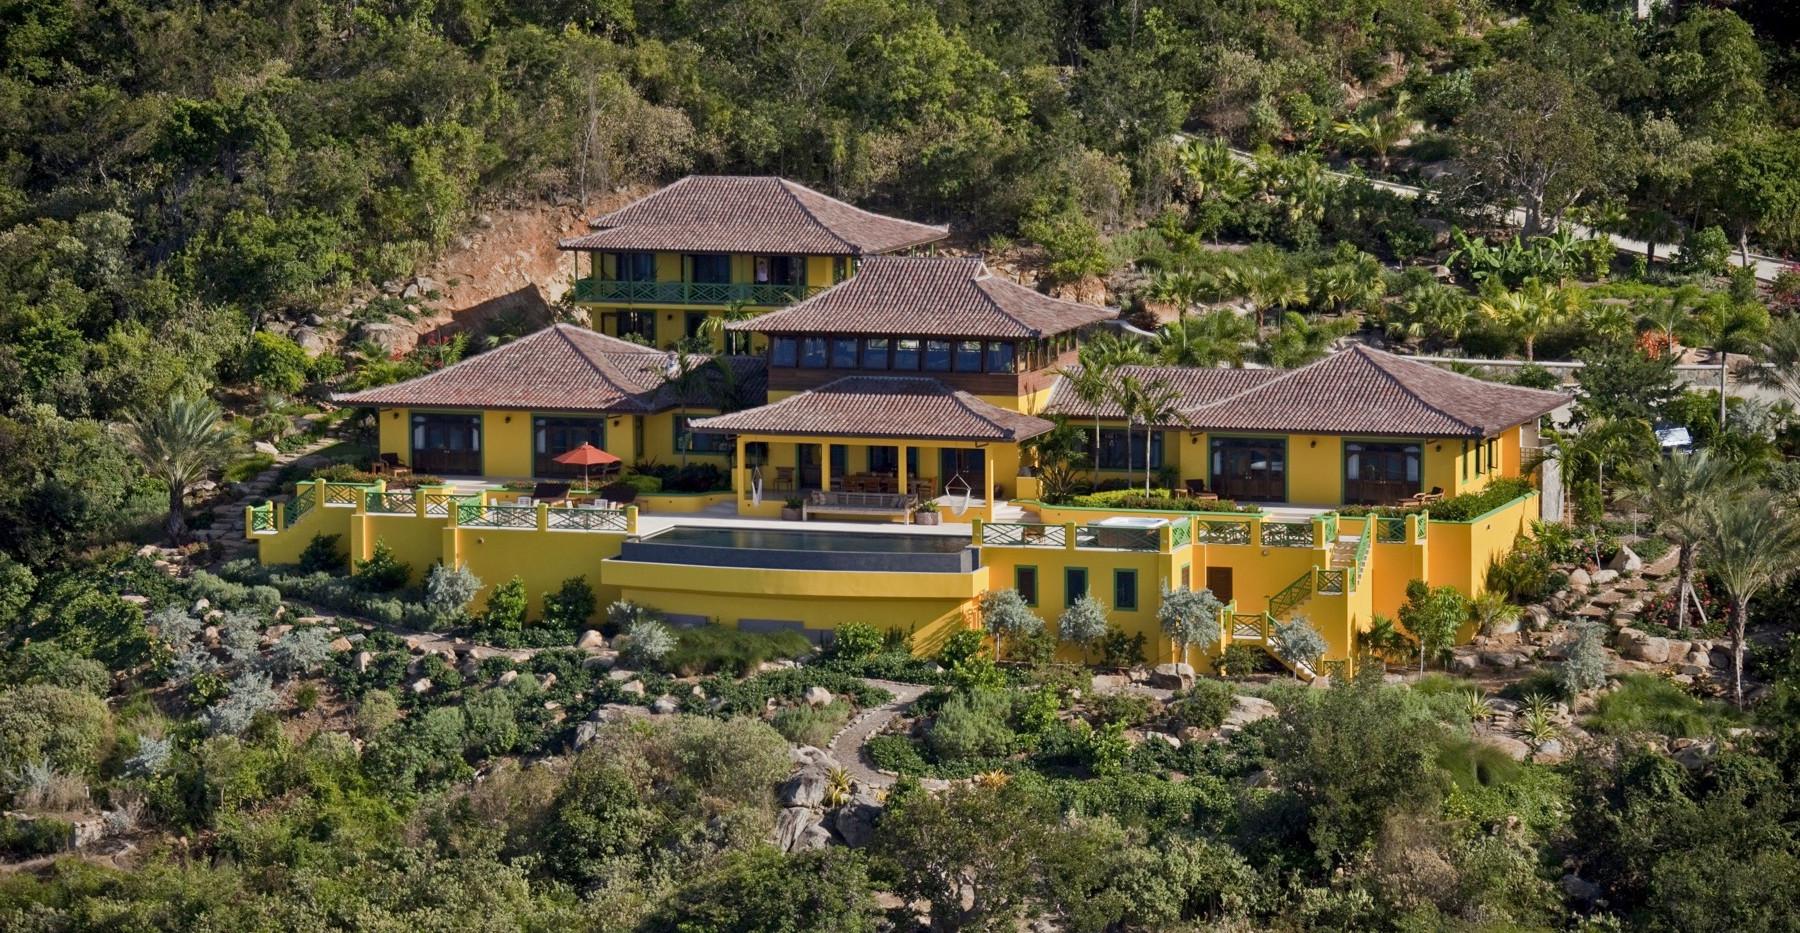 golden-pavilion-tortola-bvi-11.jpg